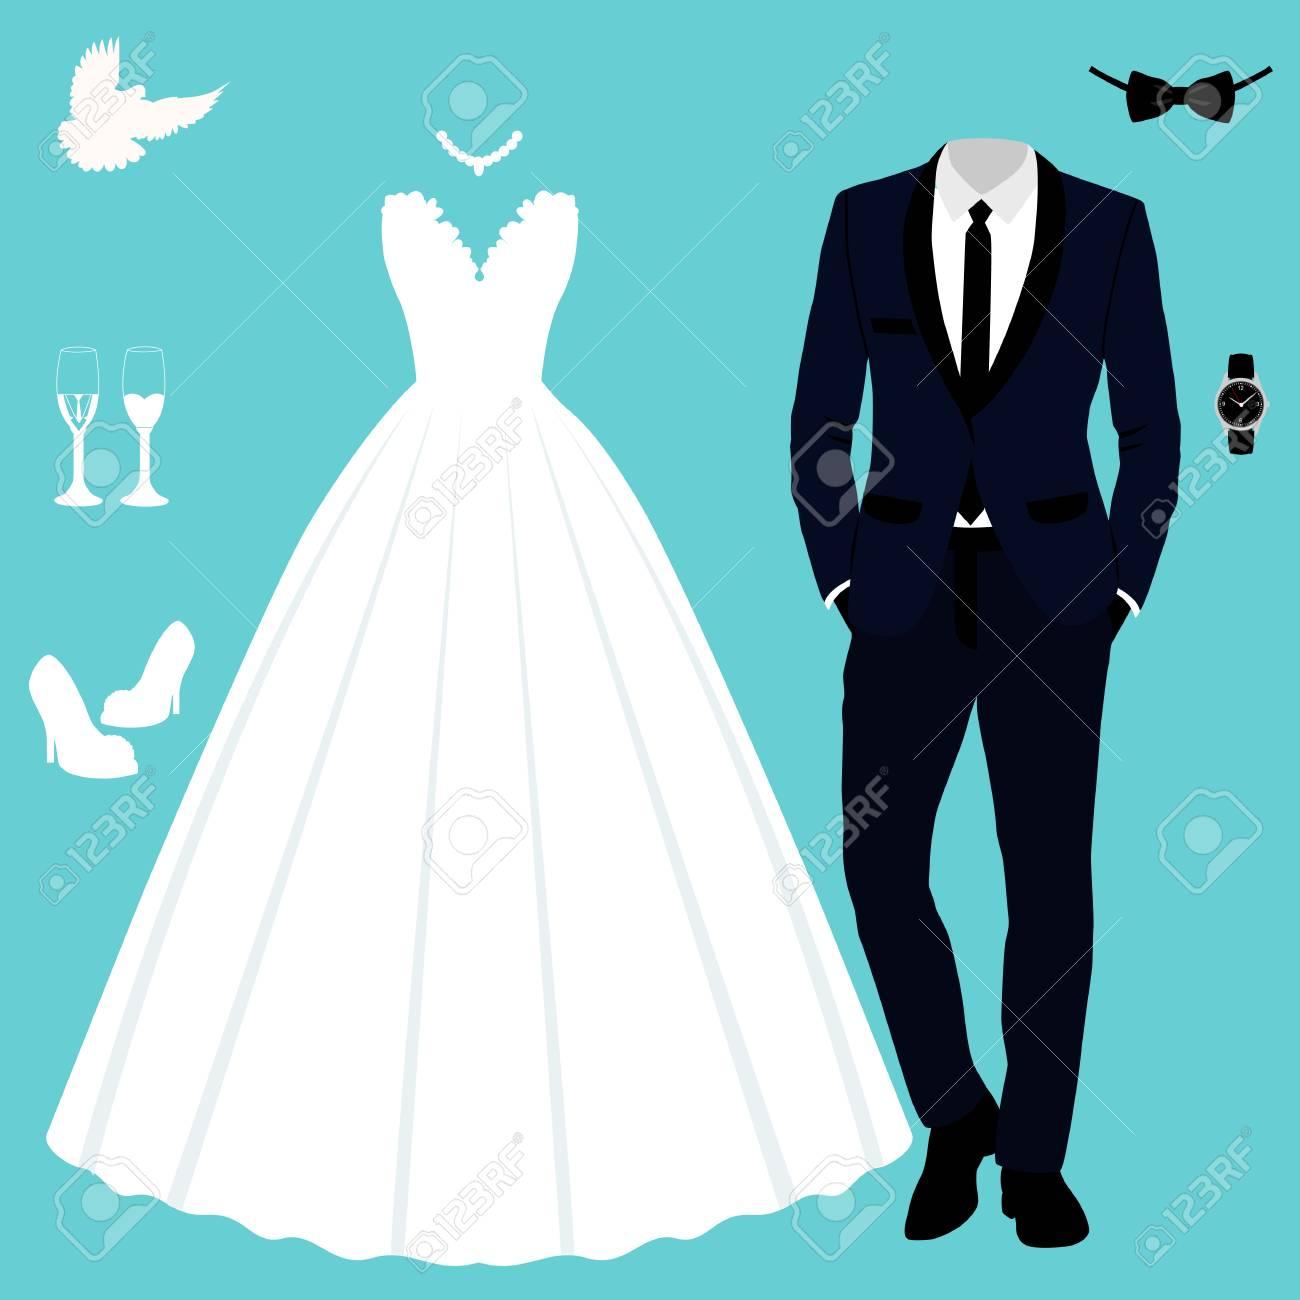 Enchanting Wedding Dress And Tuxedo Mold - Wedding Plan Ideas ...